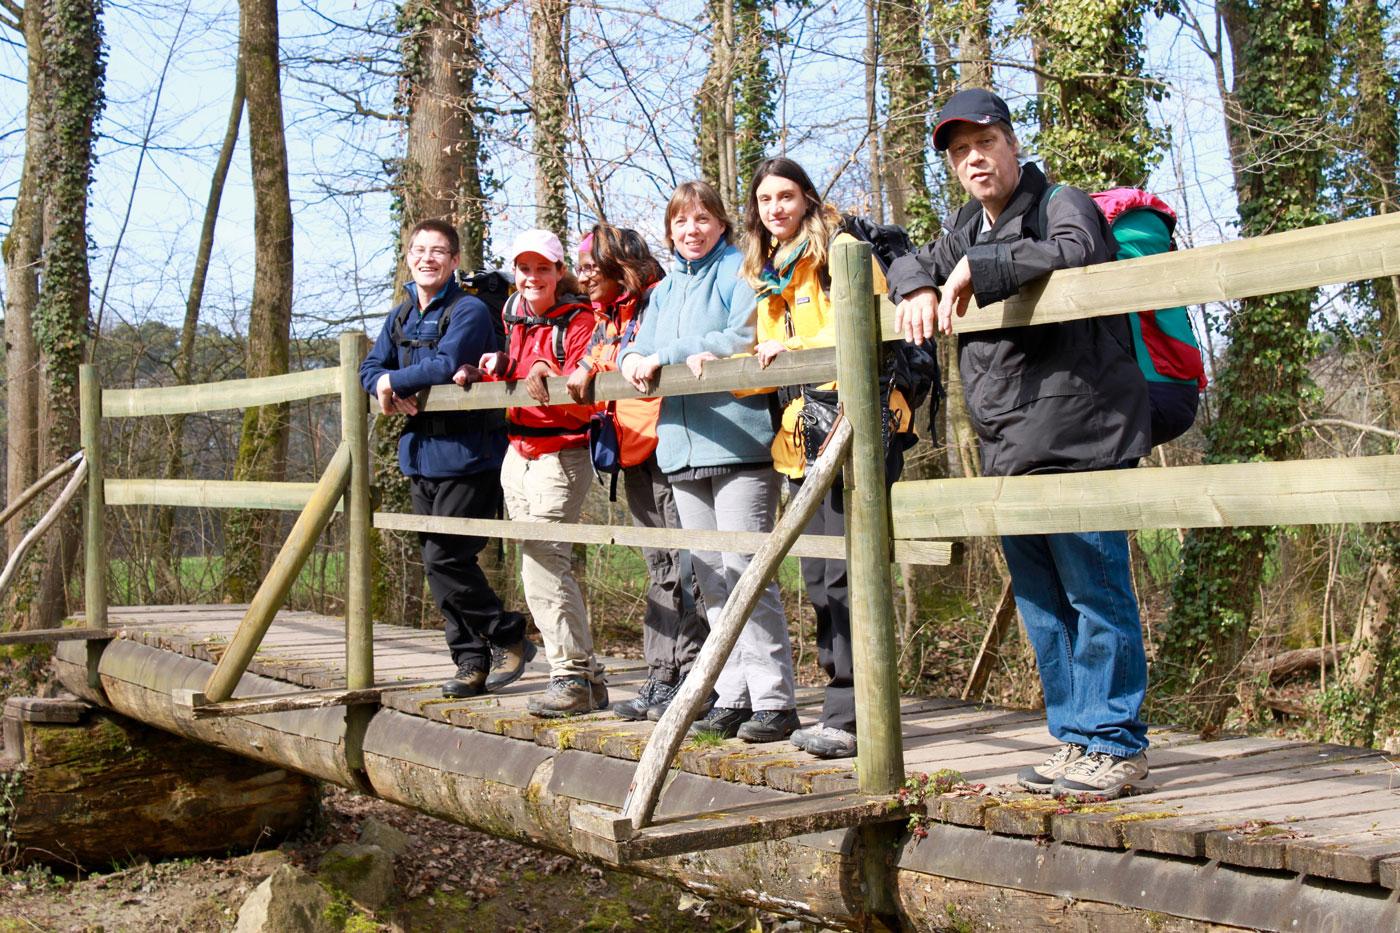 Trekking dans la nature - Association Buen Camino